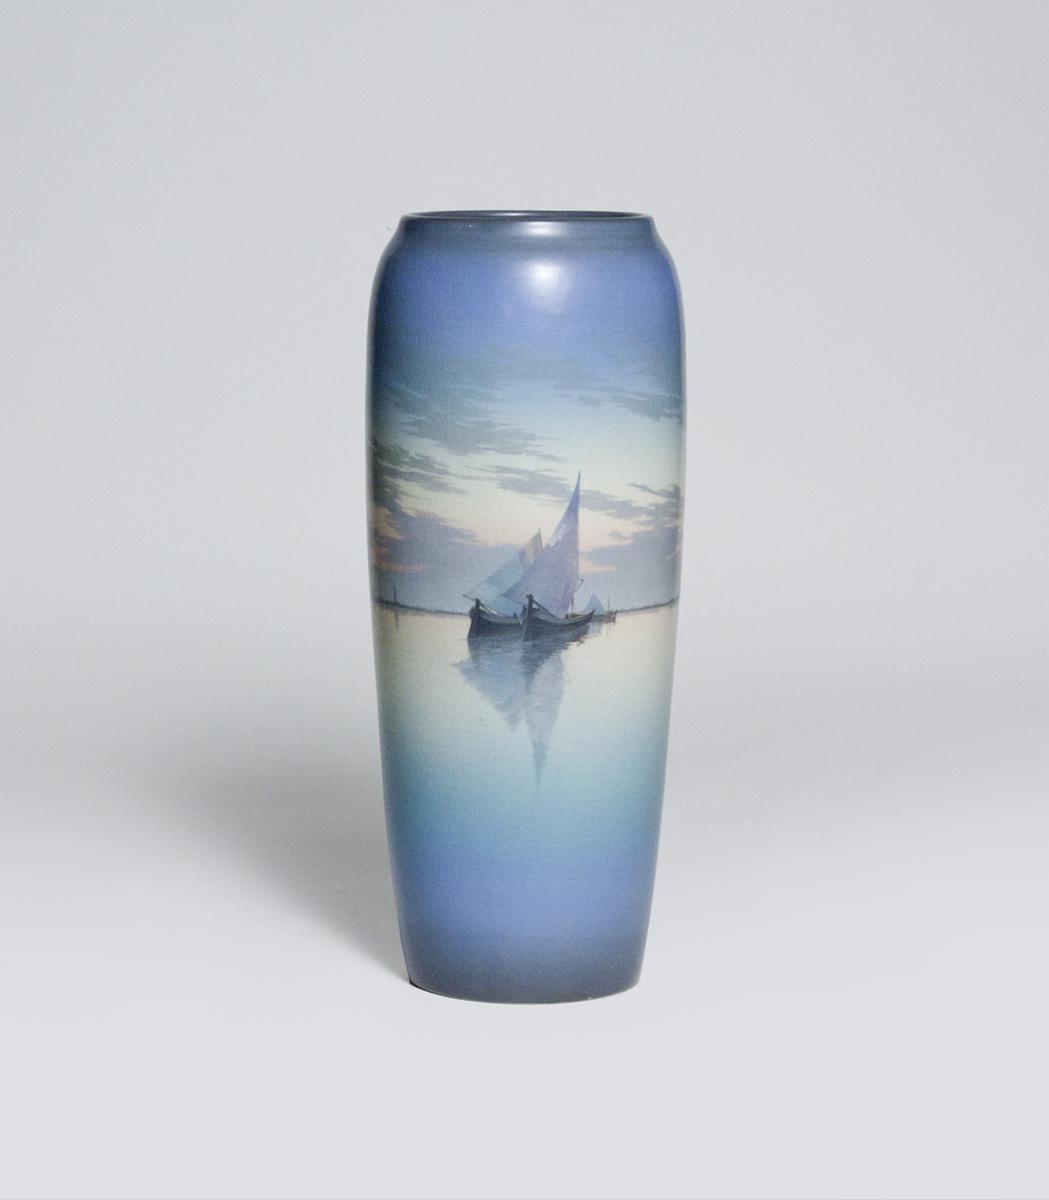 Carl Schmidt for Rookwood Pottery  'Venetian Vellum' Vase 1